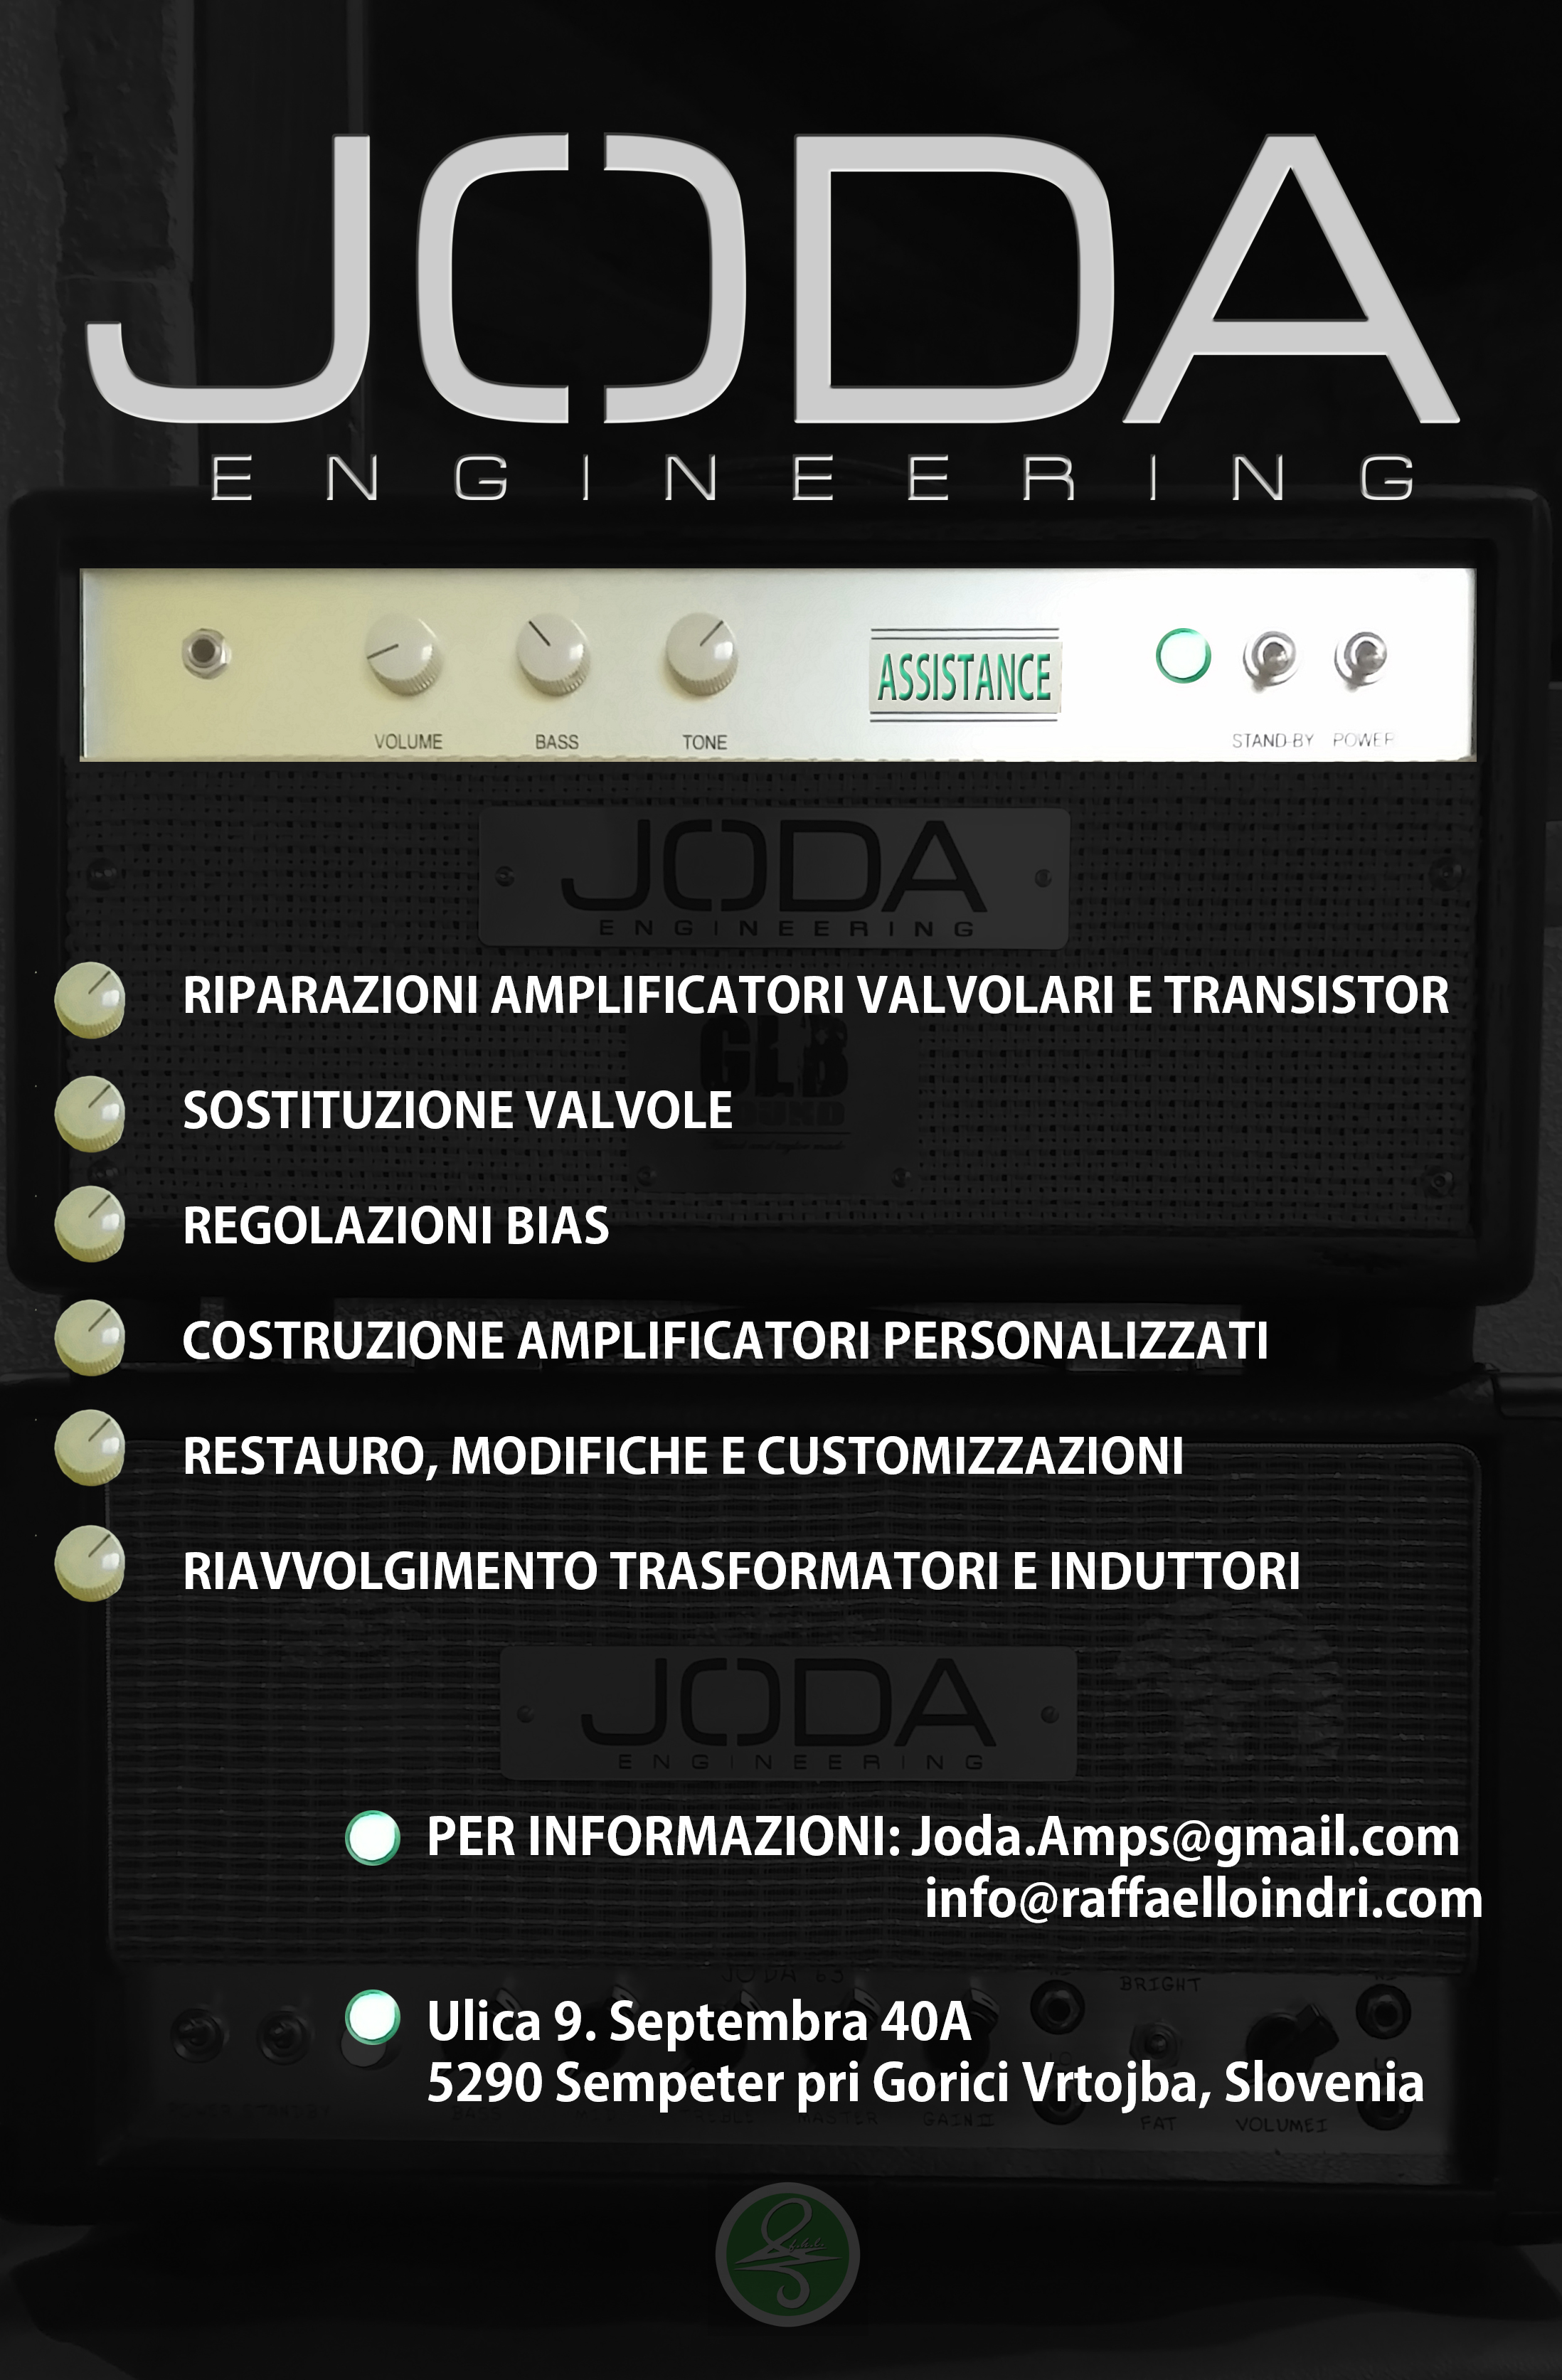 JODA ENGINEERING